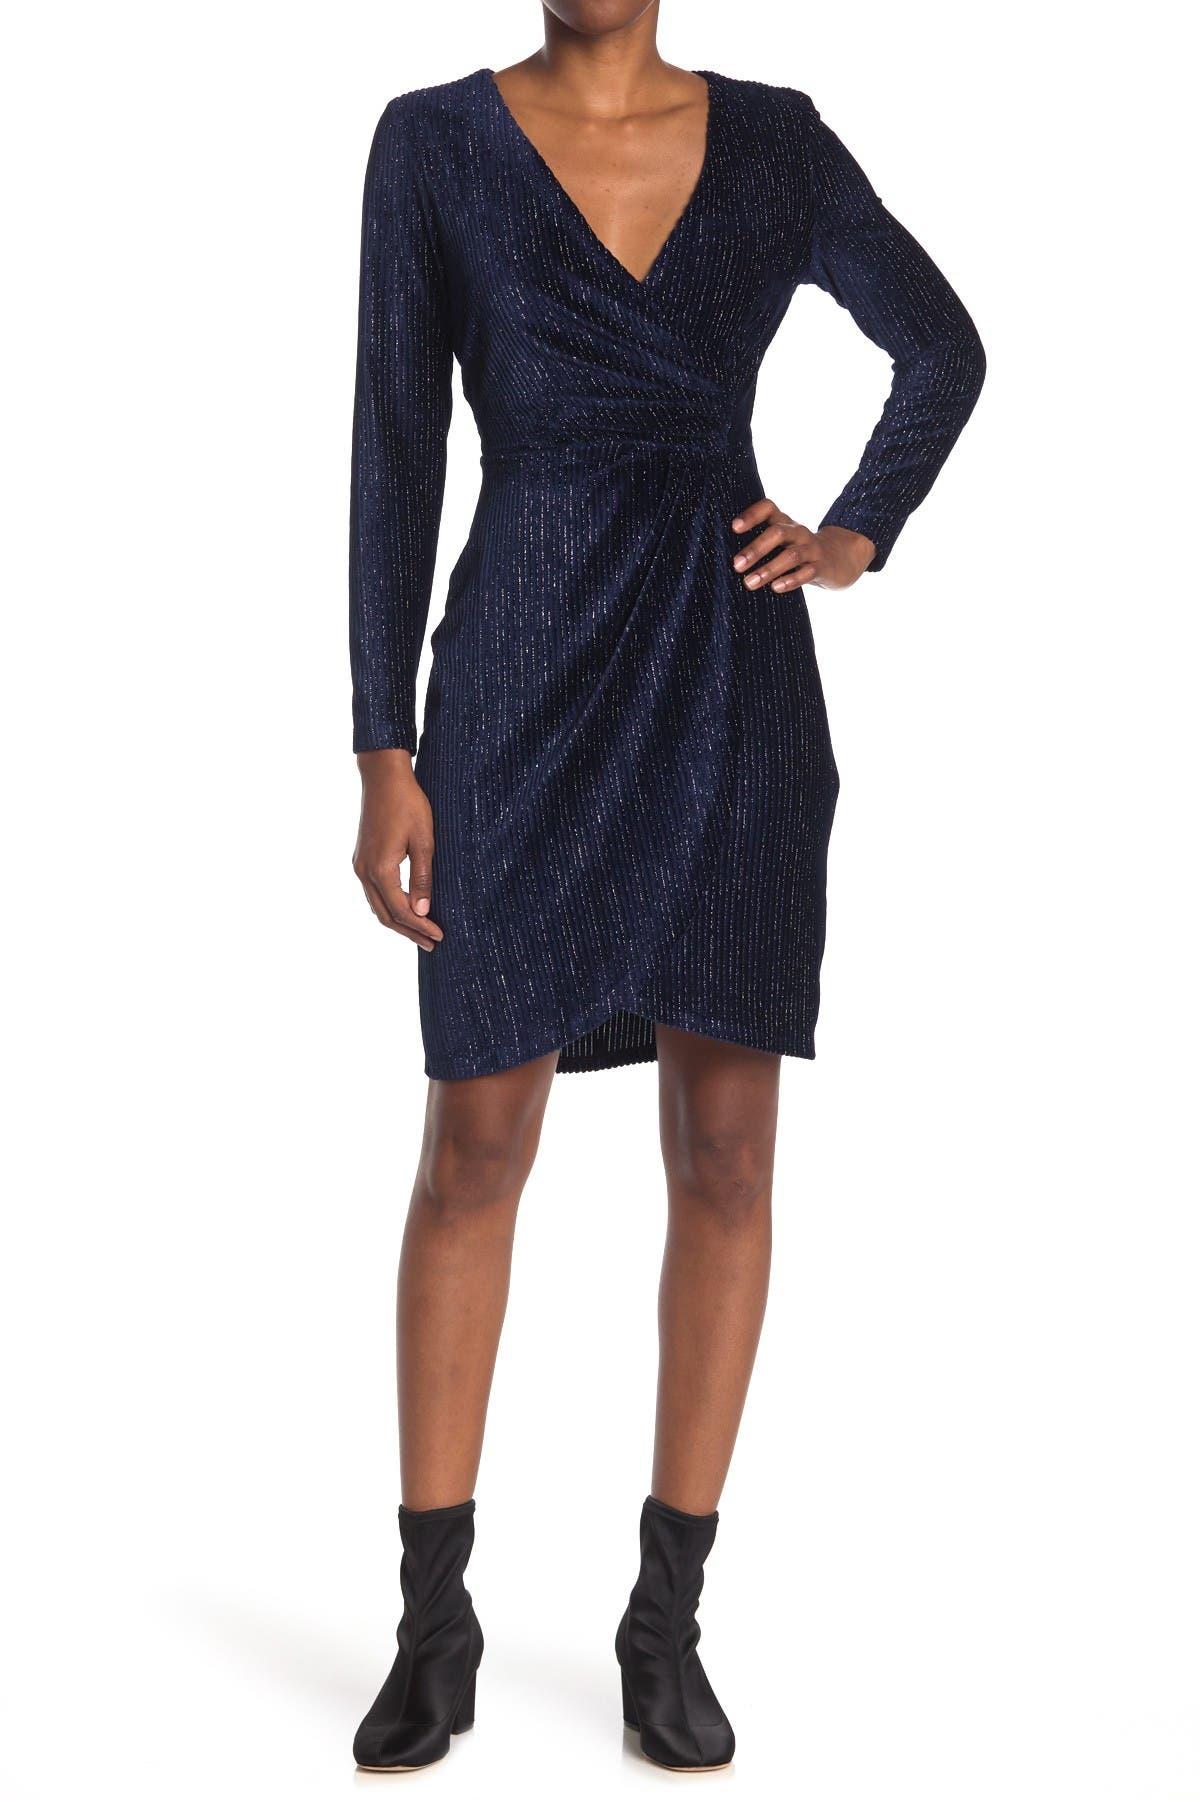 Image of Julia Jordan Metallic Stripe Ribbed Velvet Sheath Dress